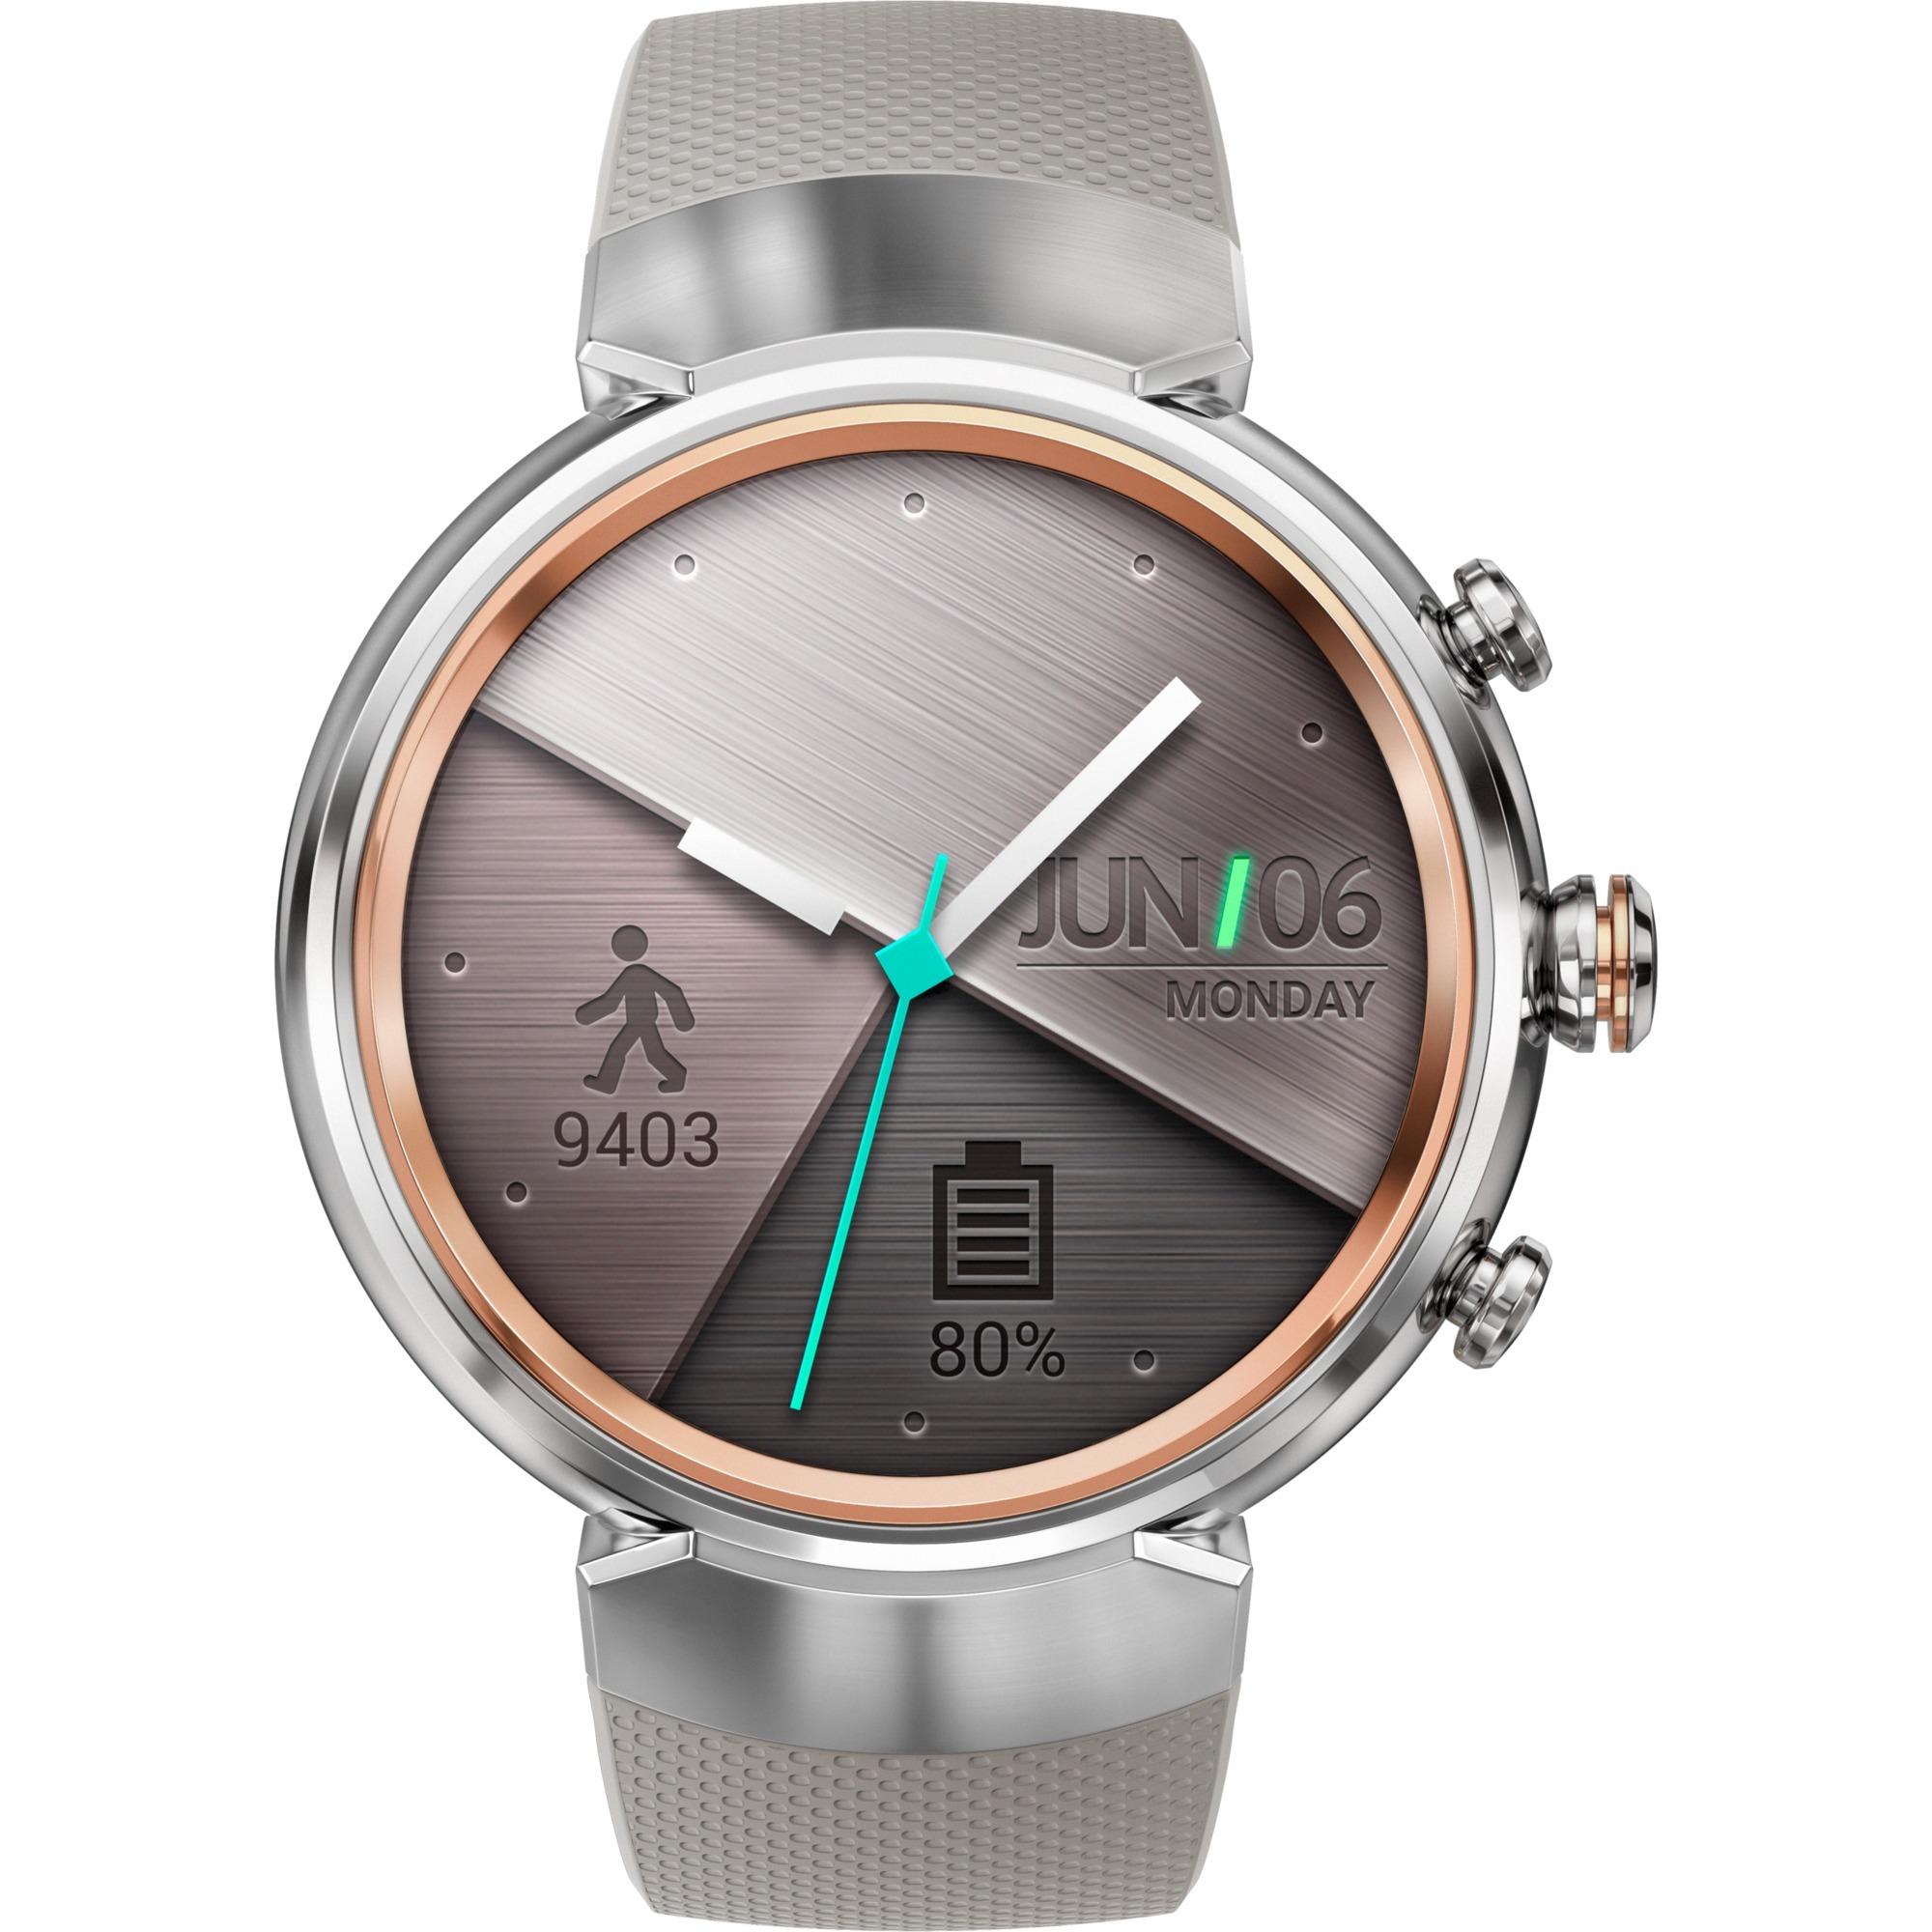 "90NZ0064-M00040 1.39"" AMOLED 80g Plata reloj inteligente, SmartWatch"